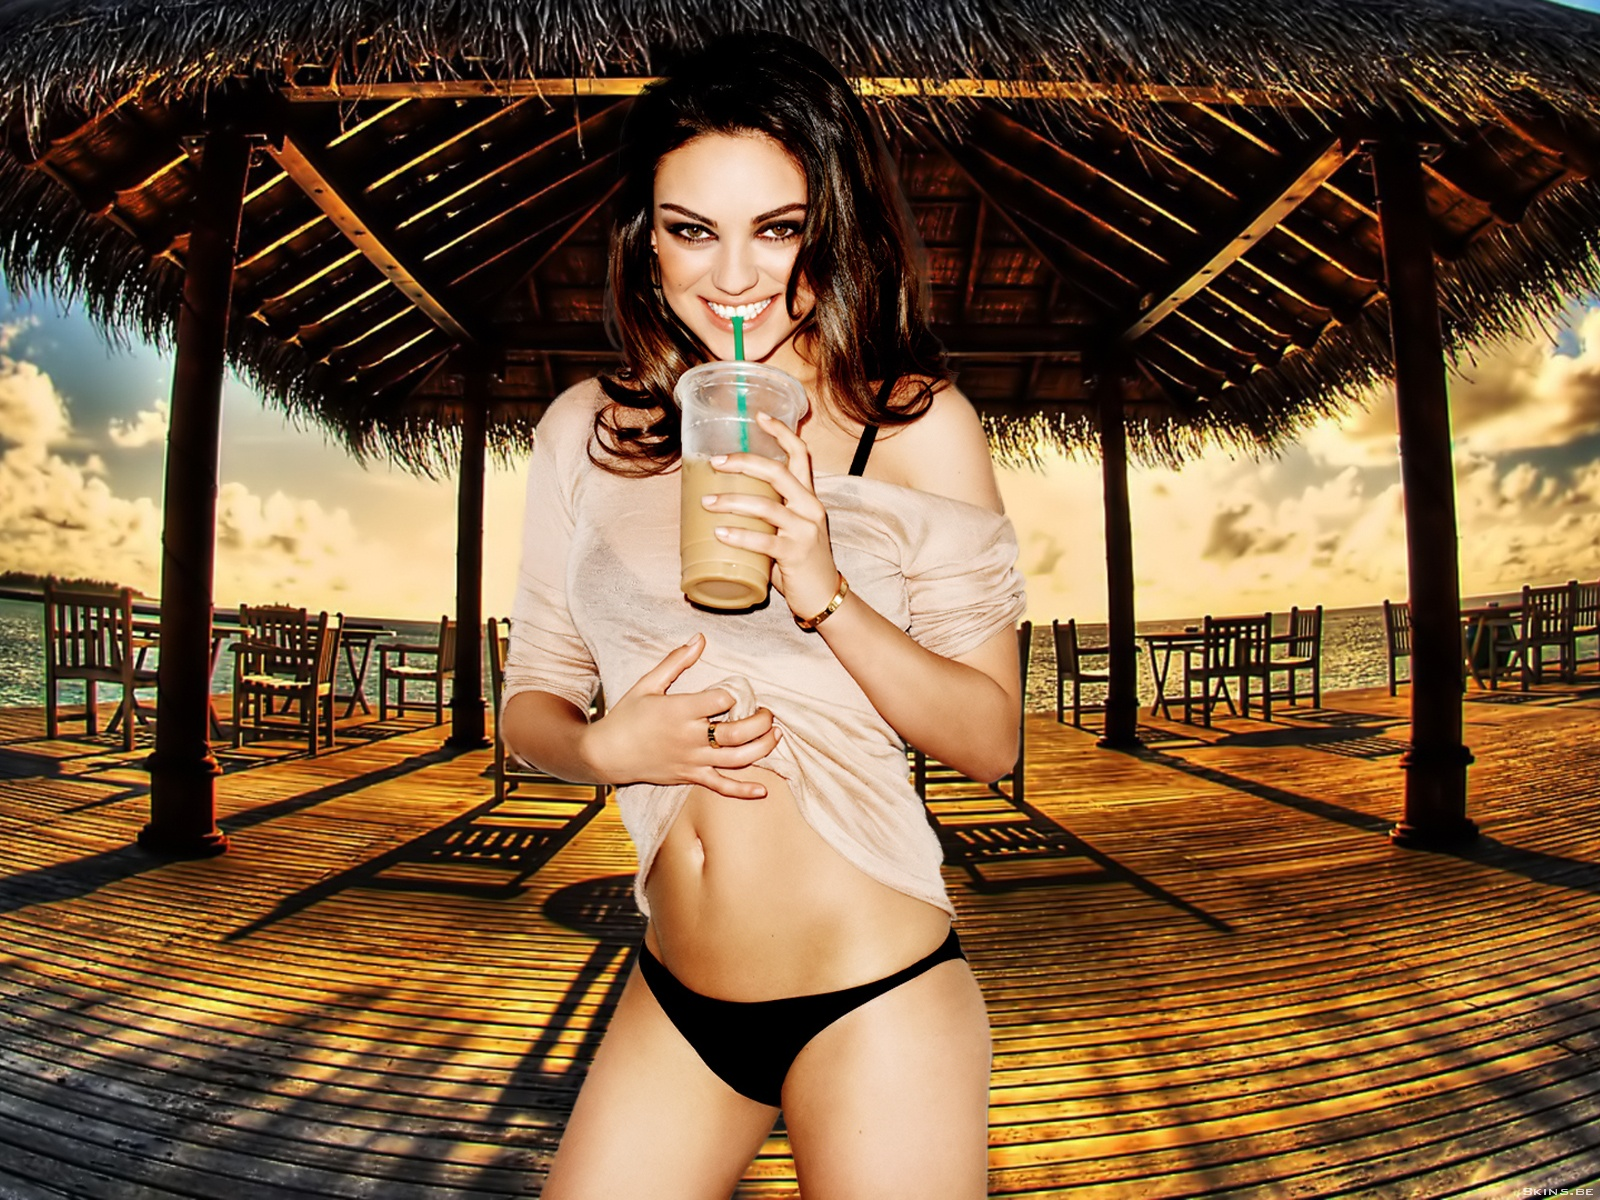 Mila Kunis wallpaper (#40195)